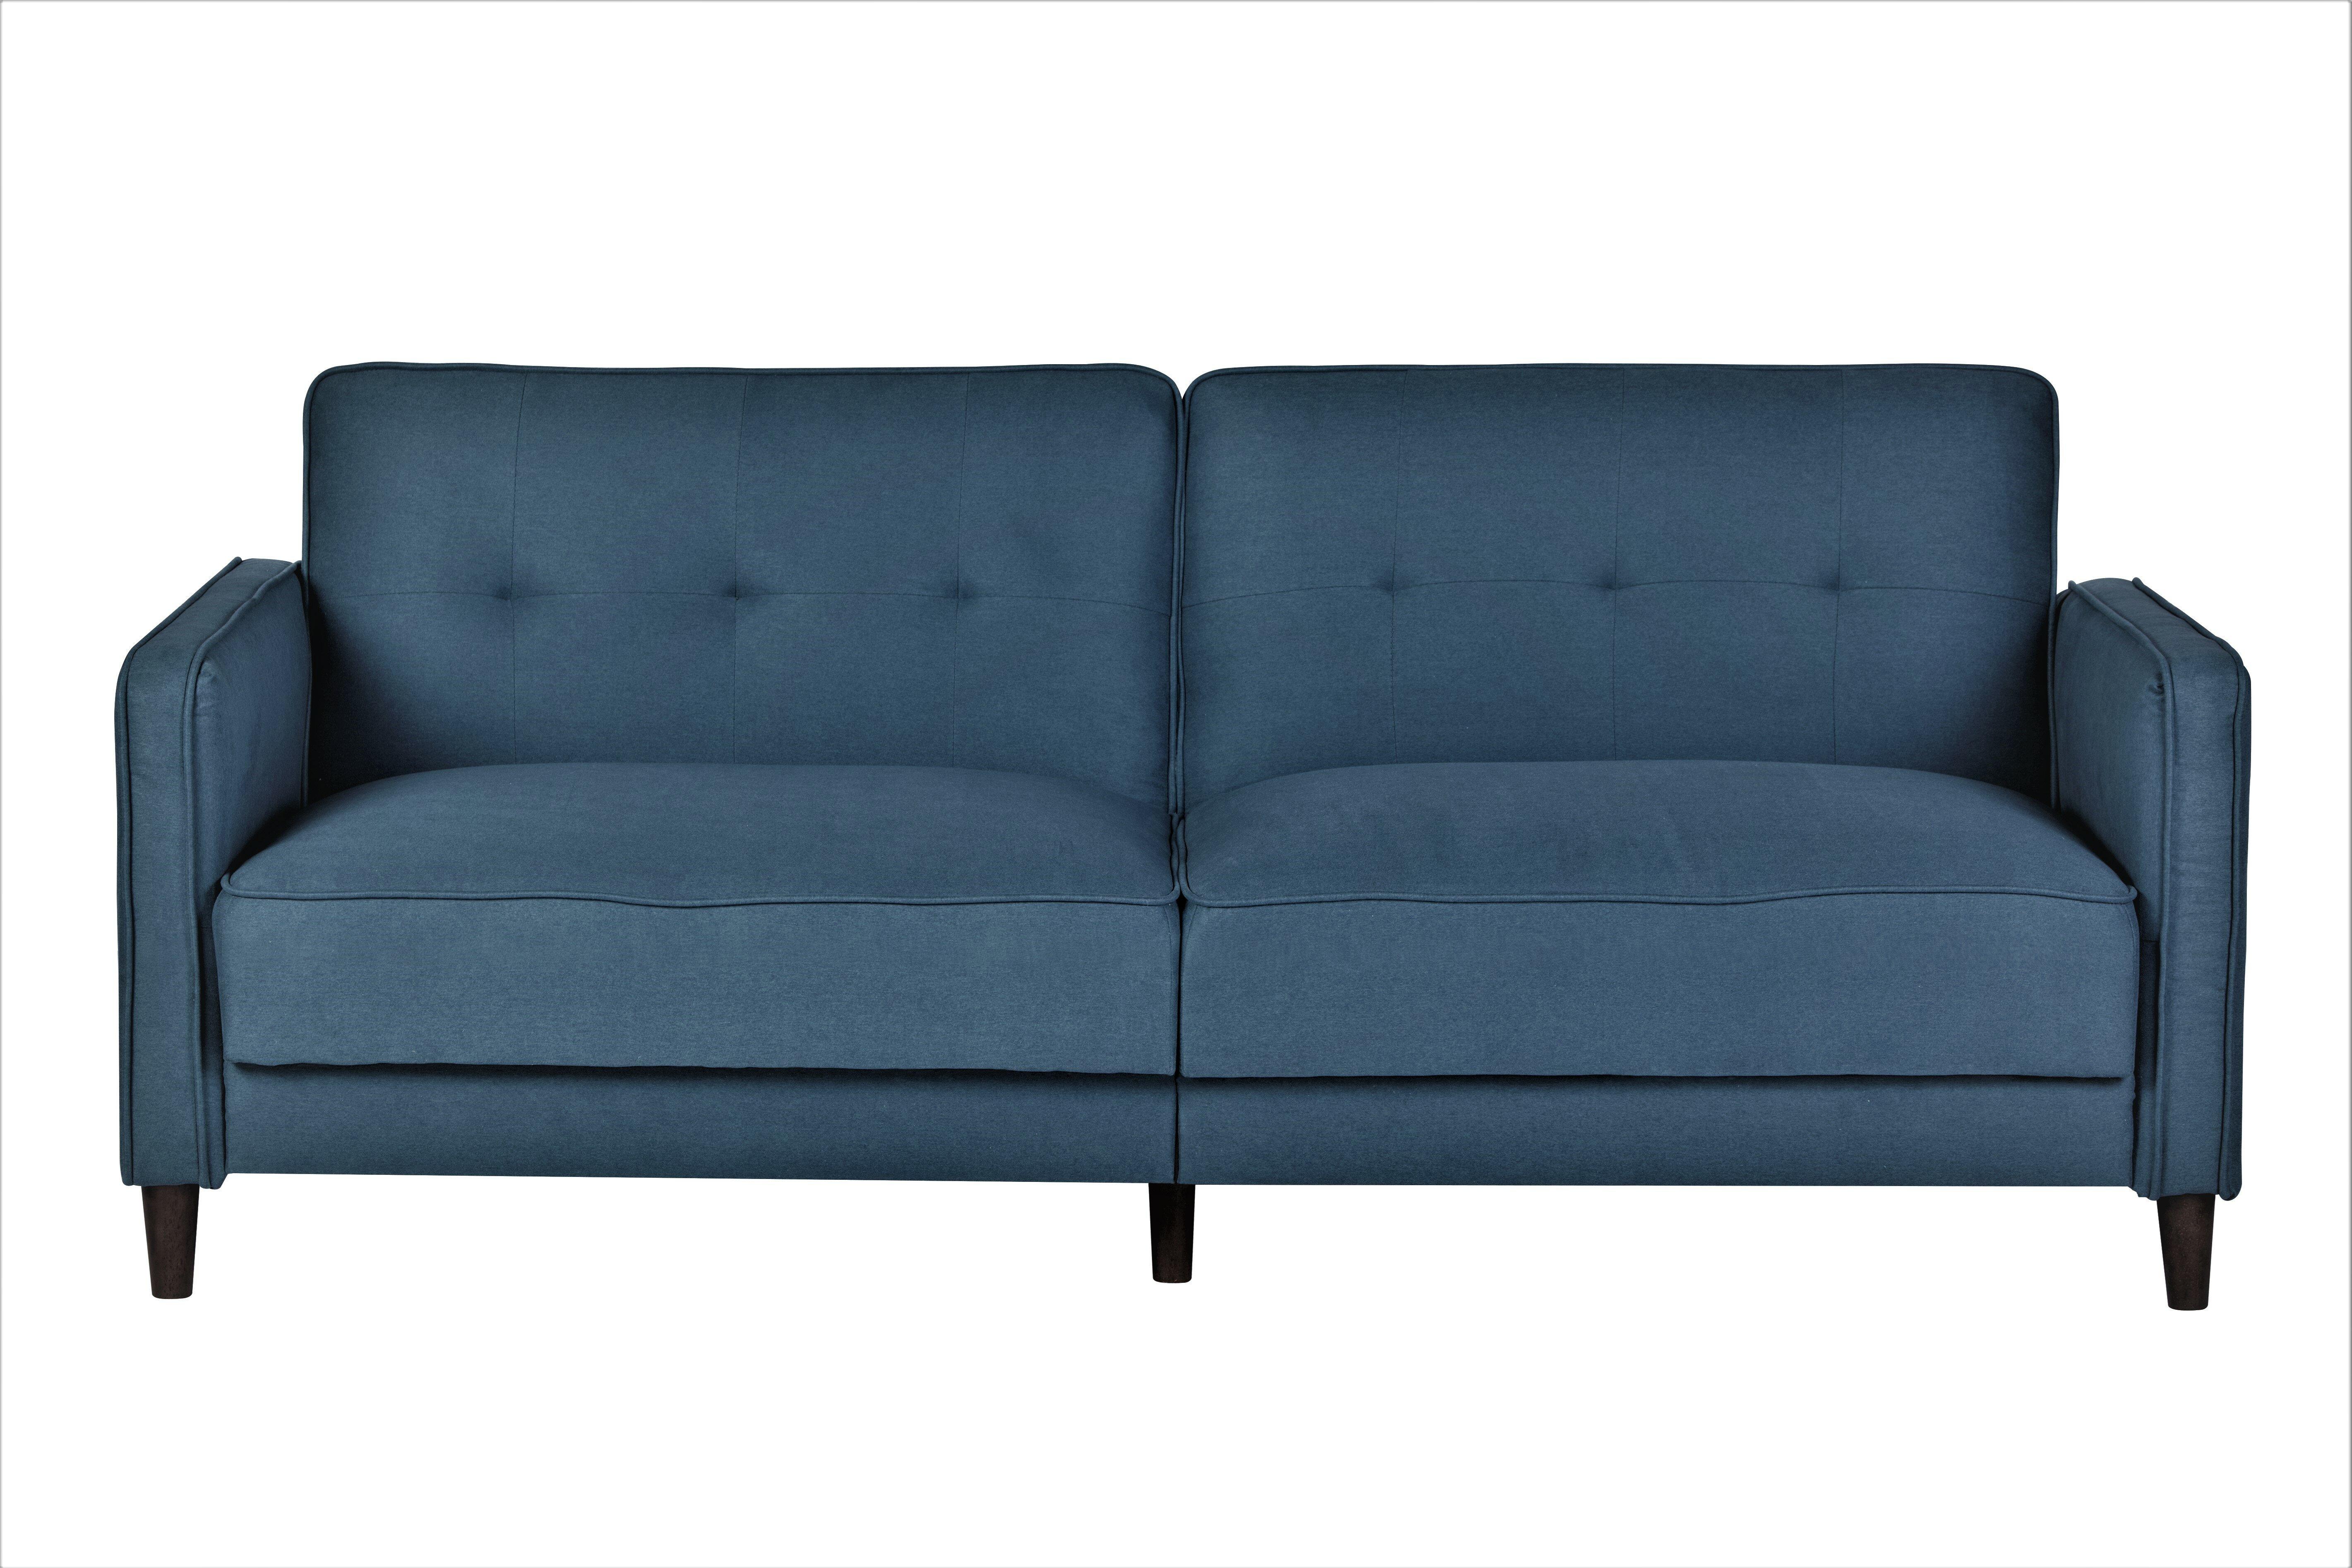 Astounding Swampscott Sofa Bed Creativecarmelina Interior Chair Design Creativecarmelinacom